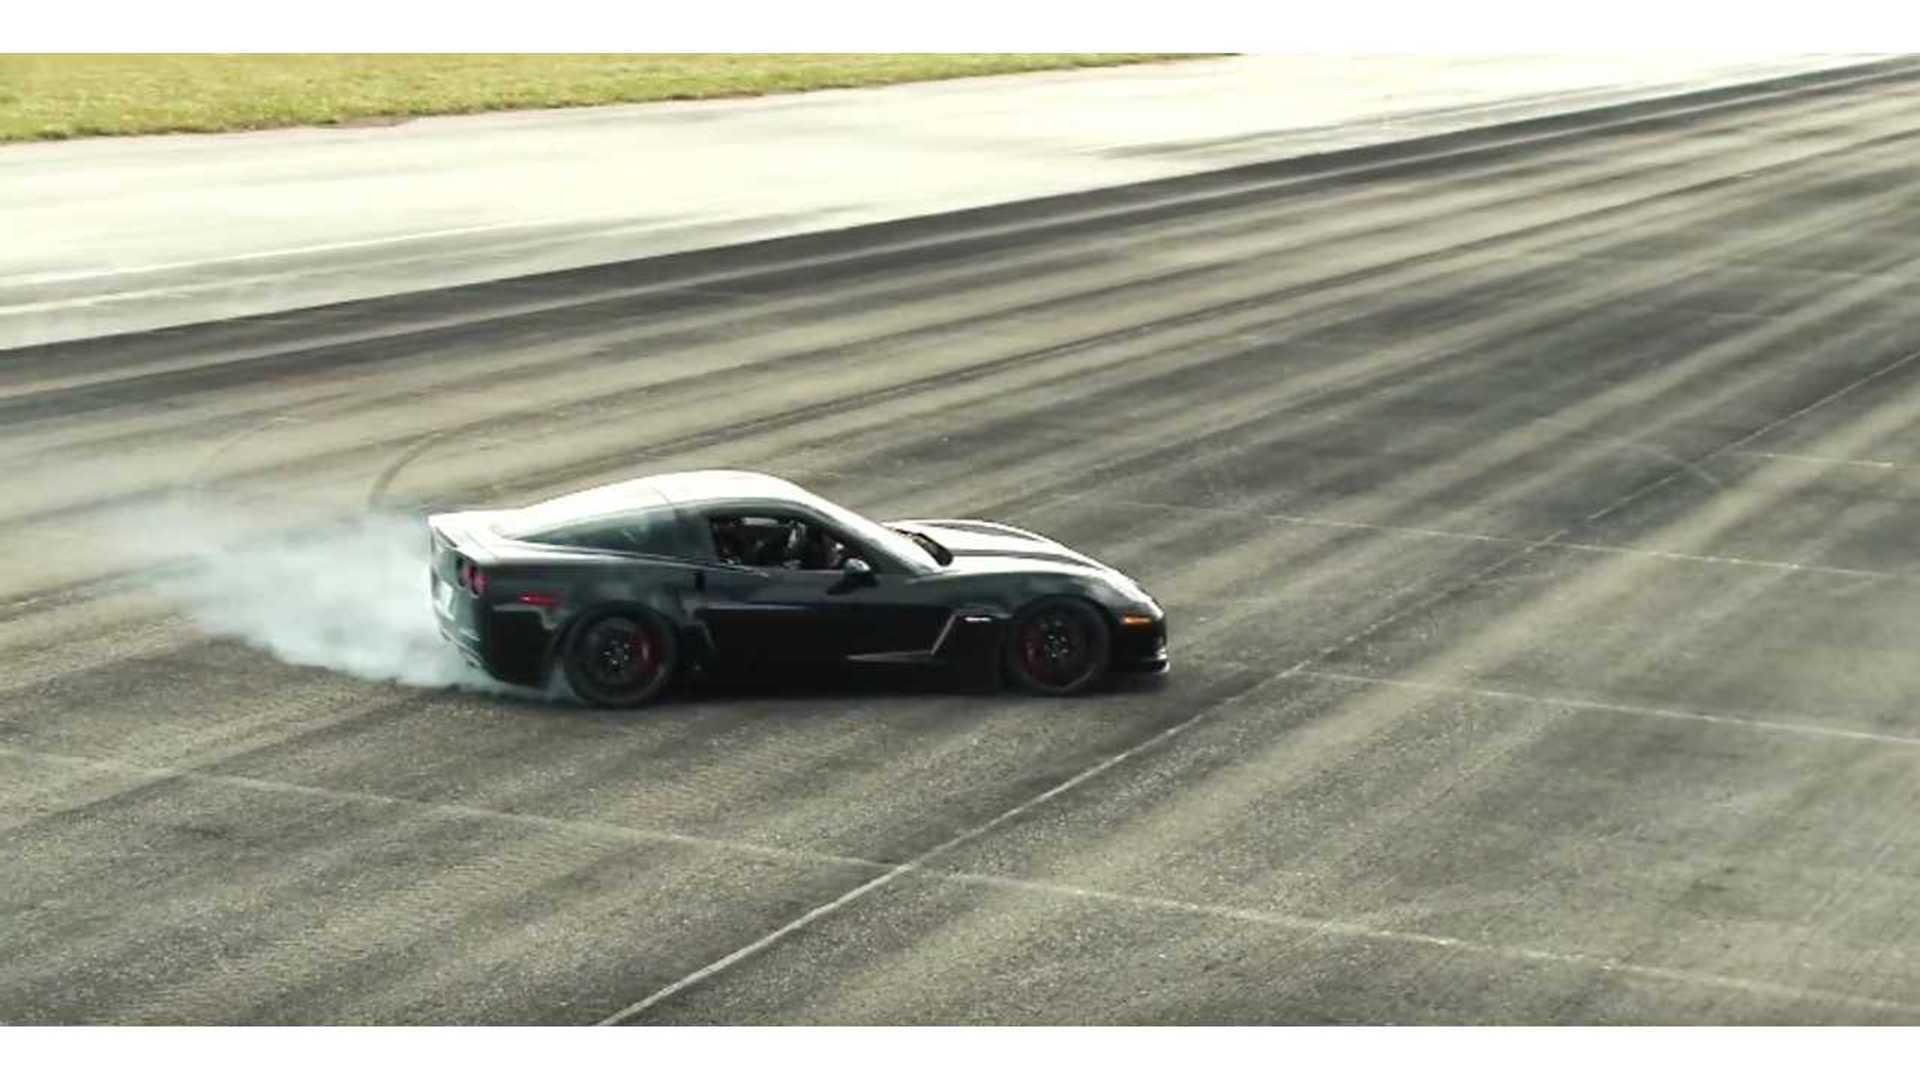 Genovation Corvette Sets 186 8 mph (300 km/h) Speed Record